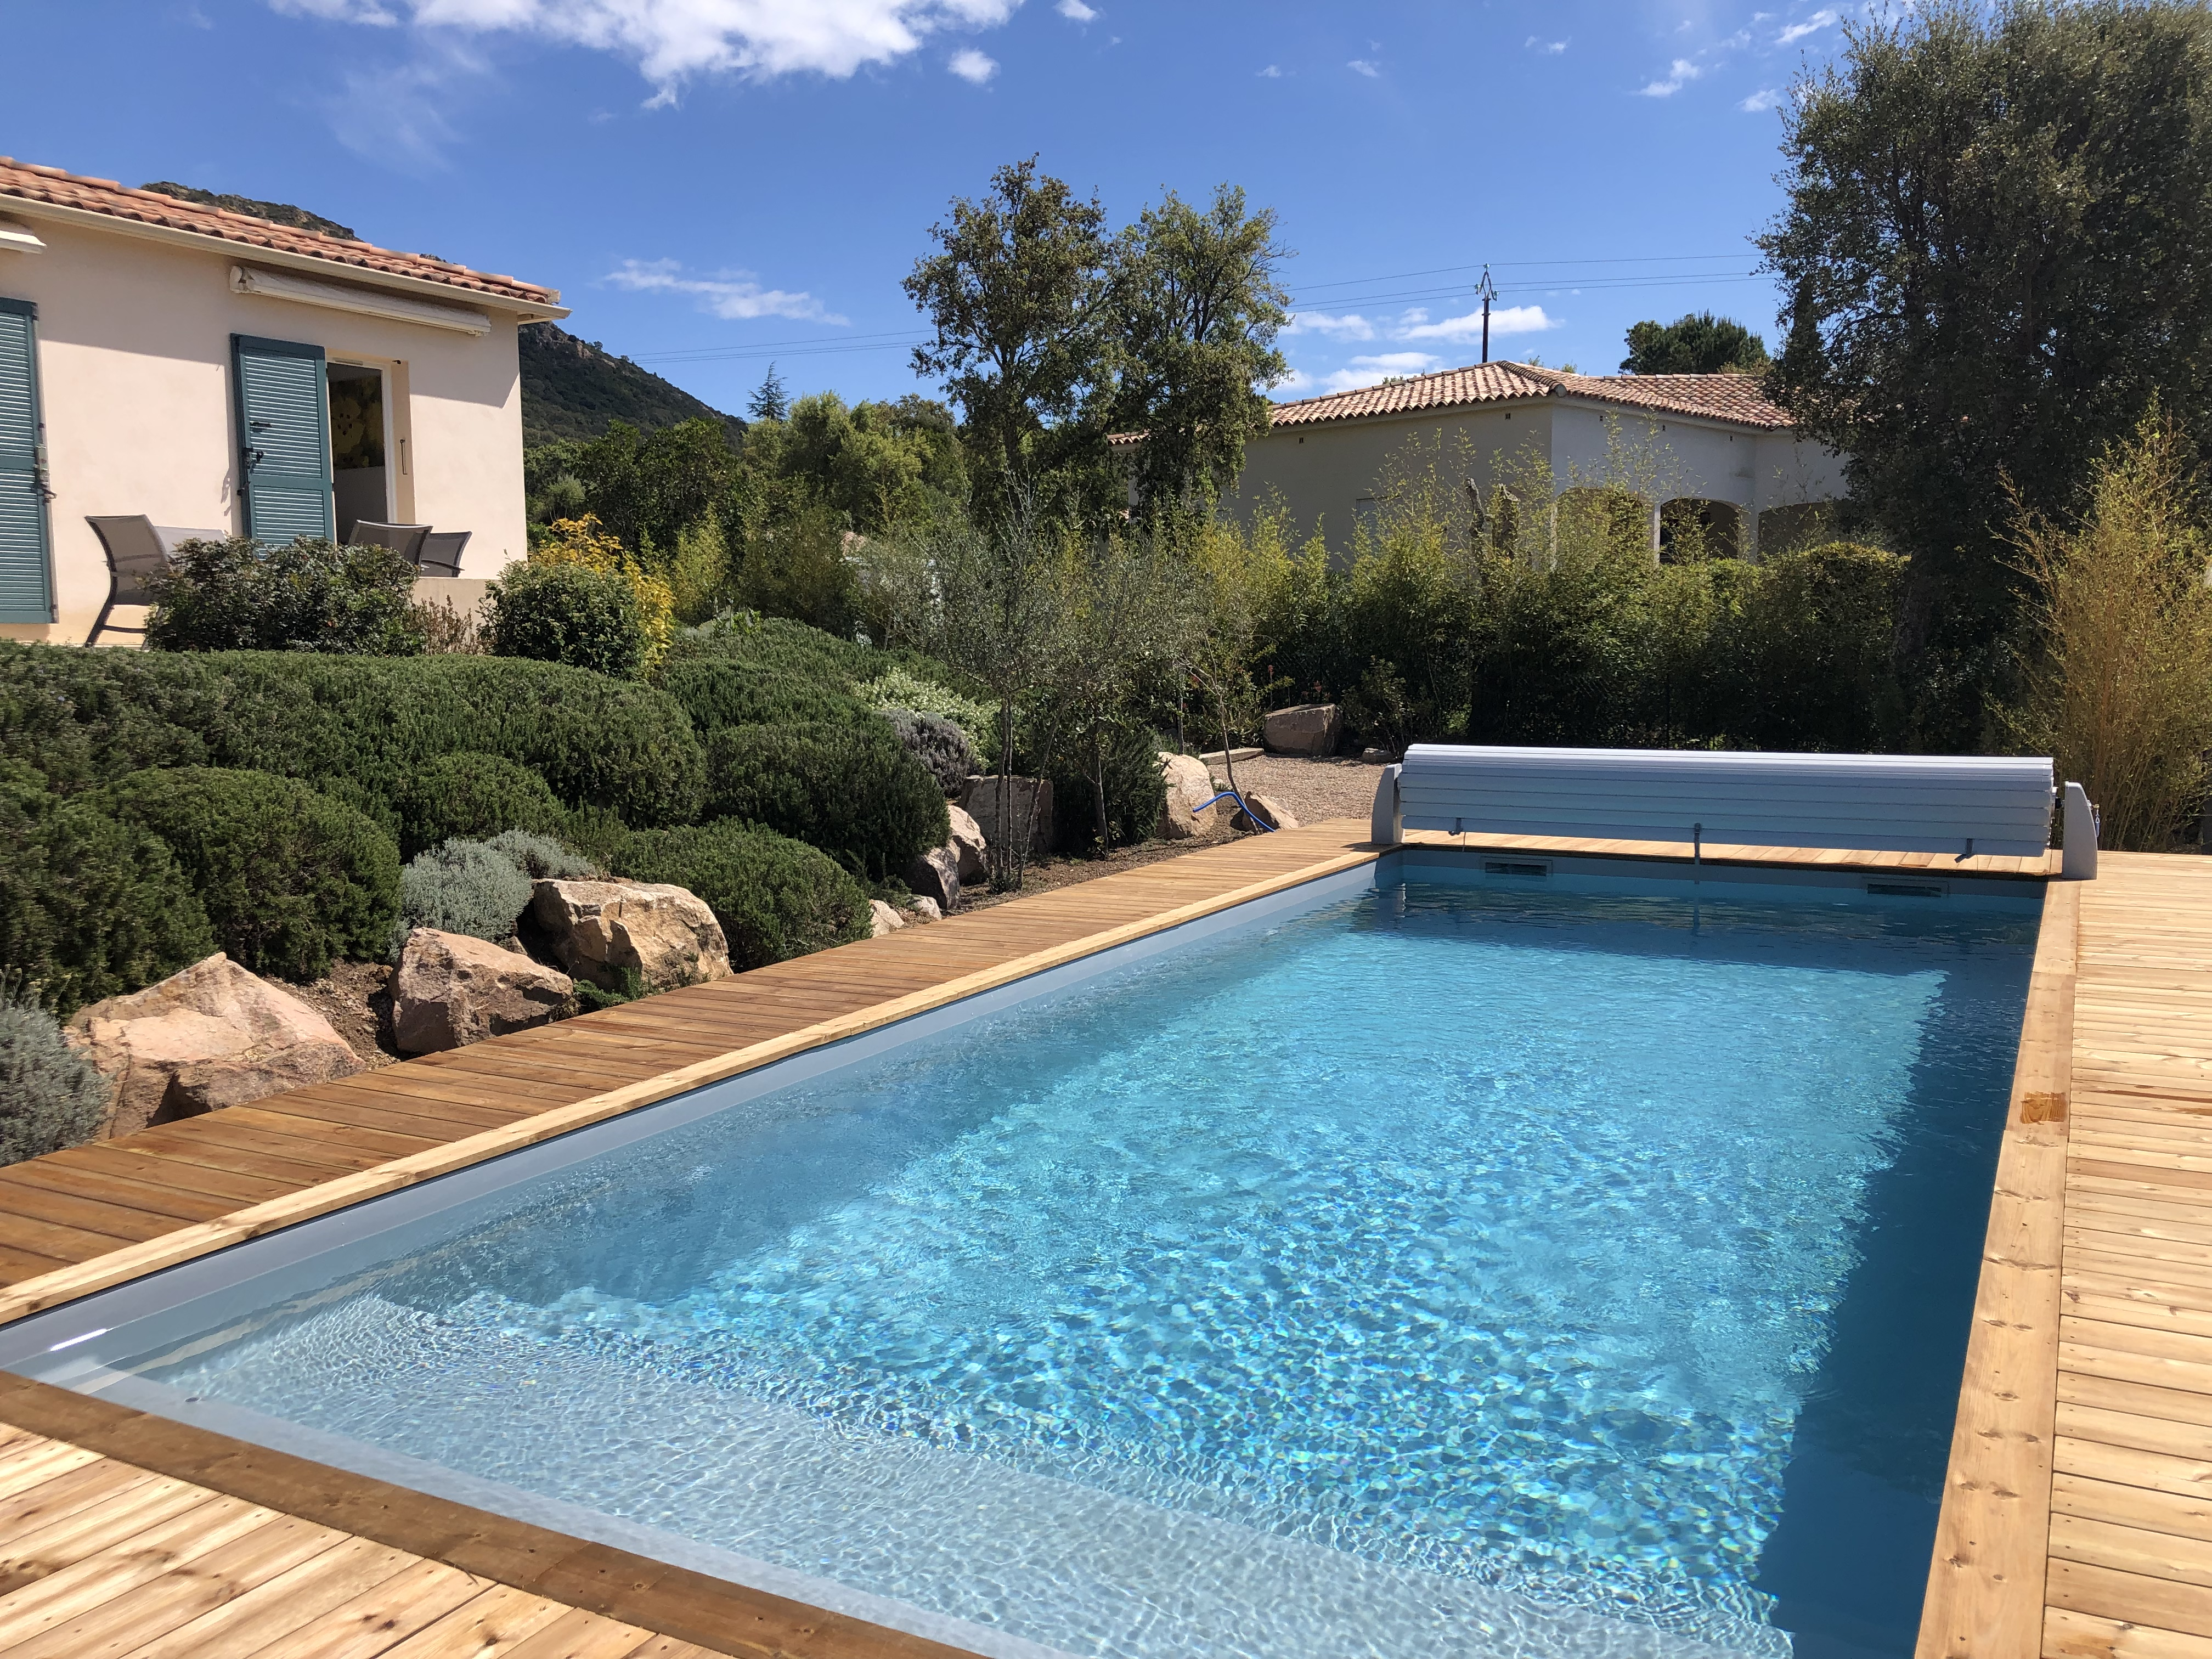 Ferienhaus Korsika mit Pool mieten